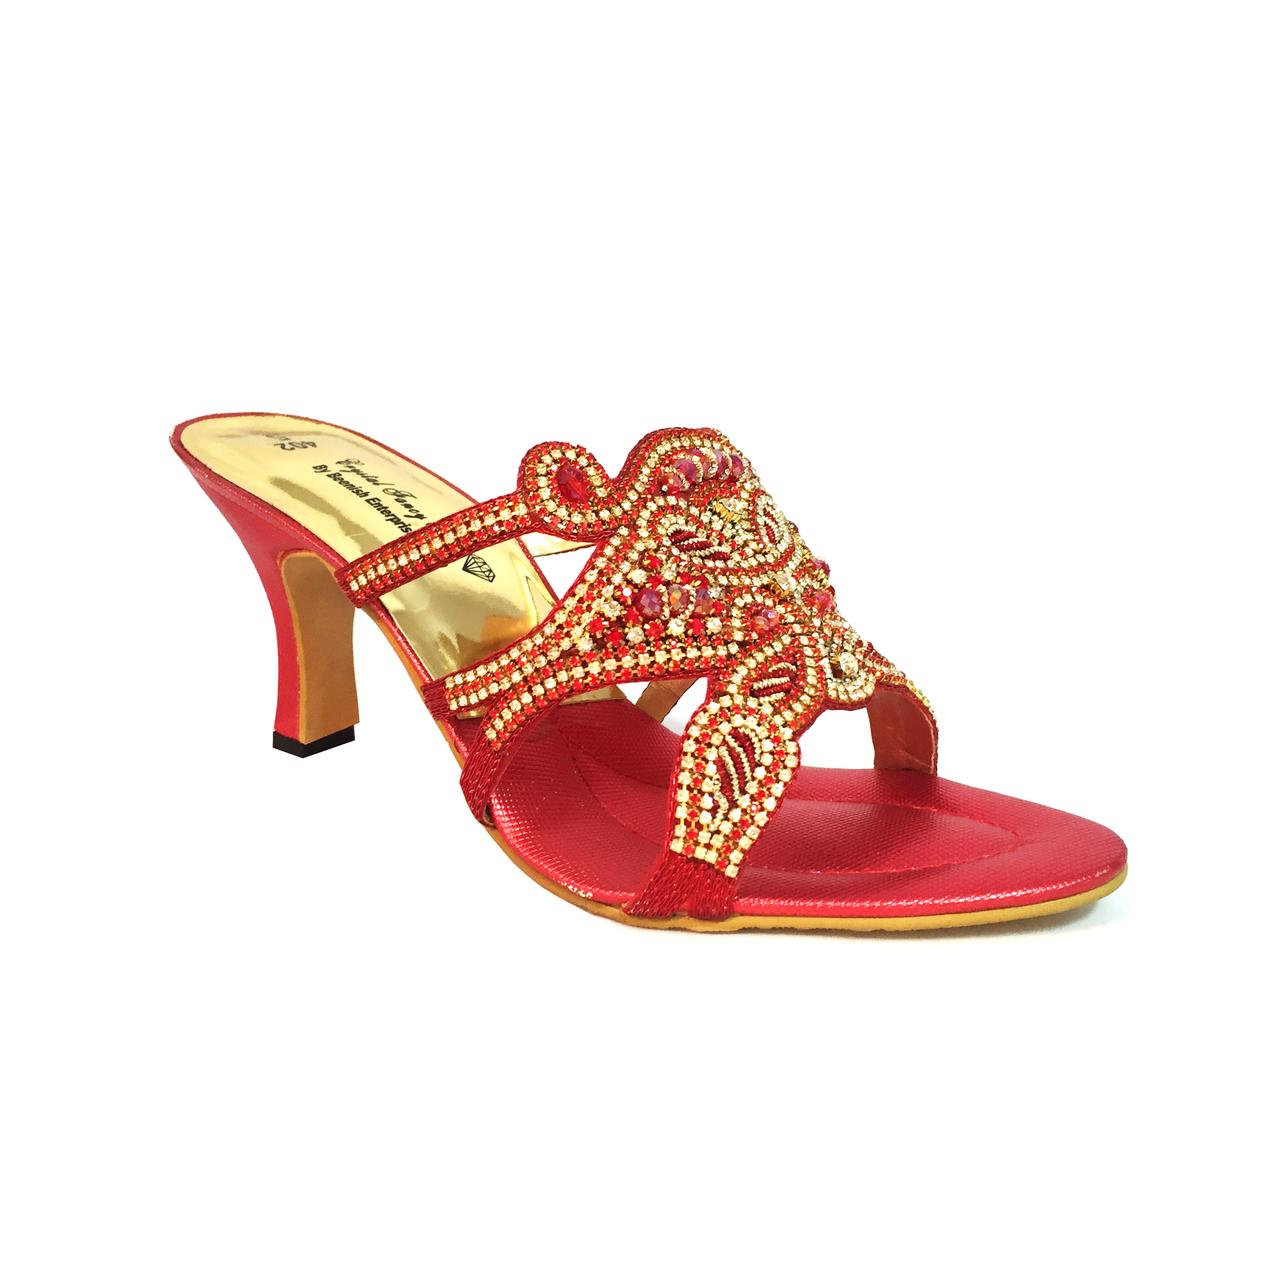 Heel Sandals – The most attractive type of footwear in the UK